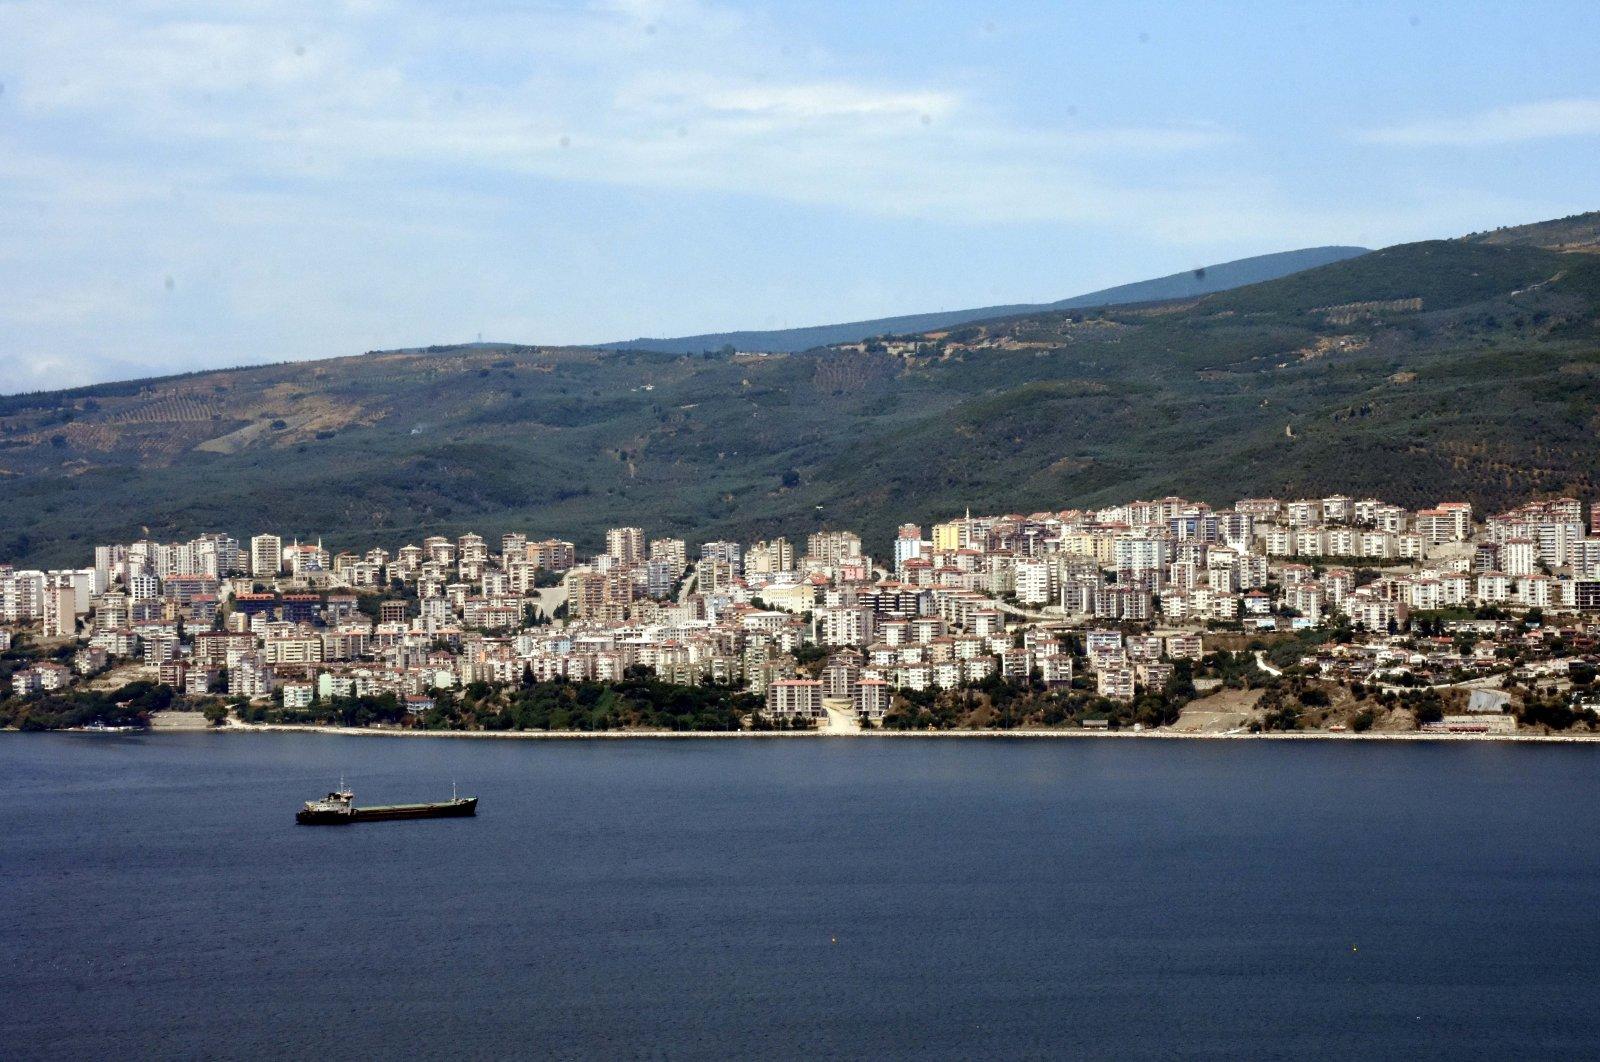 Residential buildings are seen on the coast of Gemlik in northwestern Bursa province, Turkey, June 29, 2018. (AA Photo)